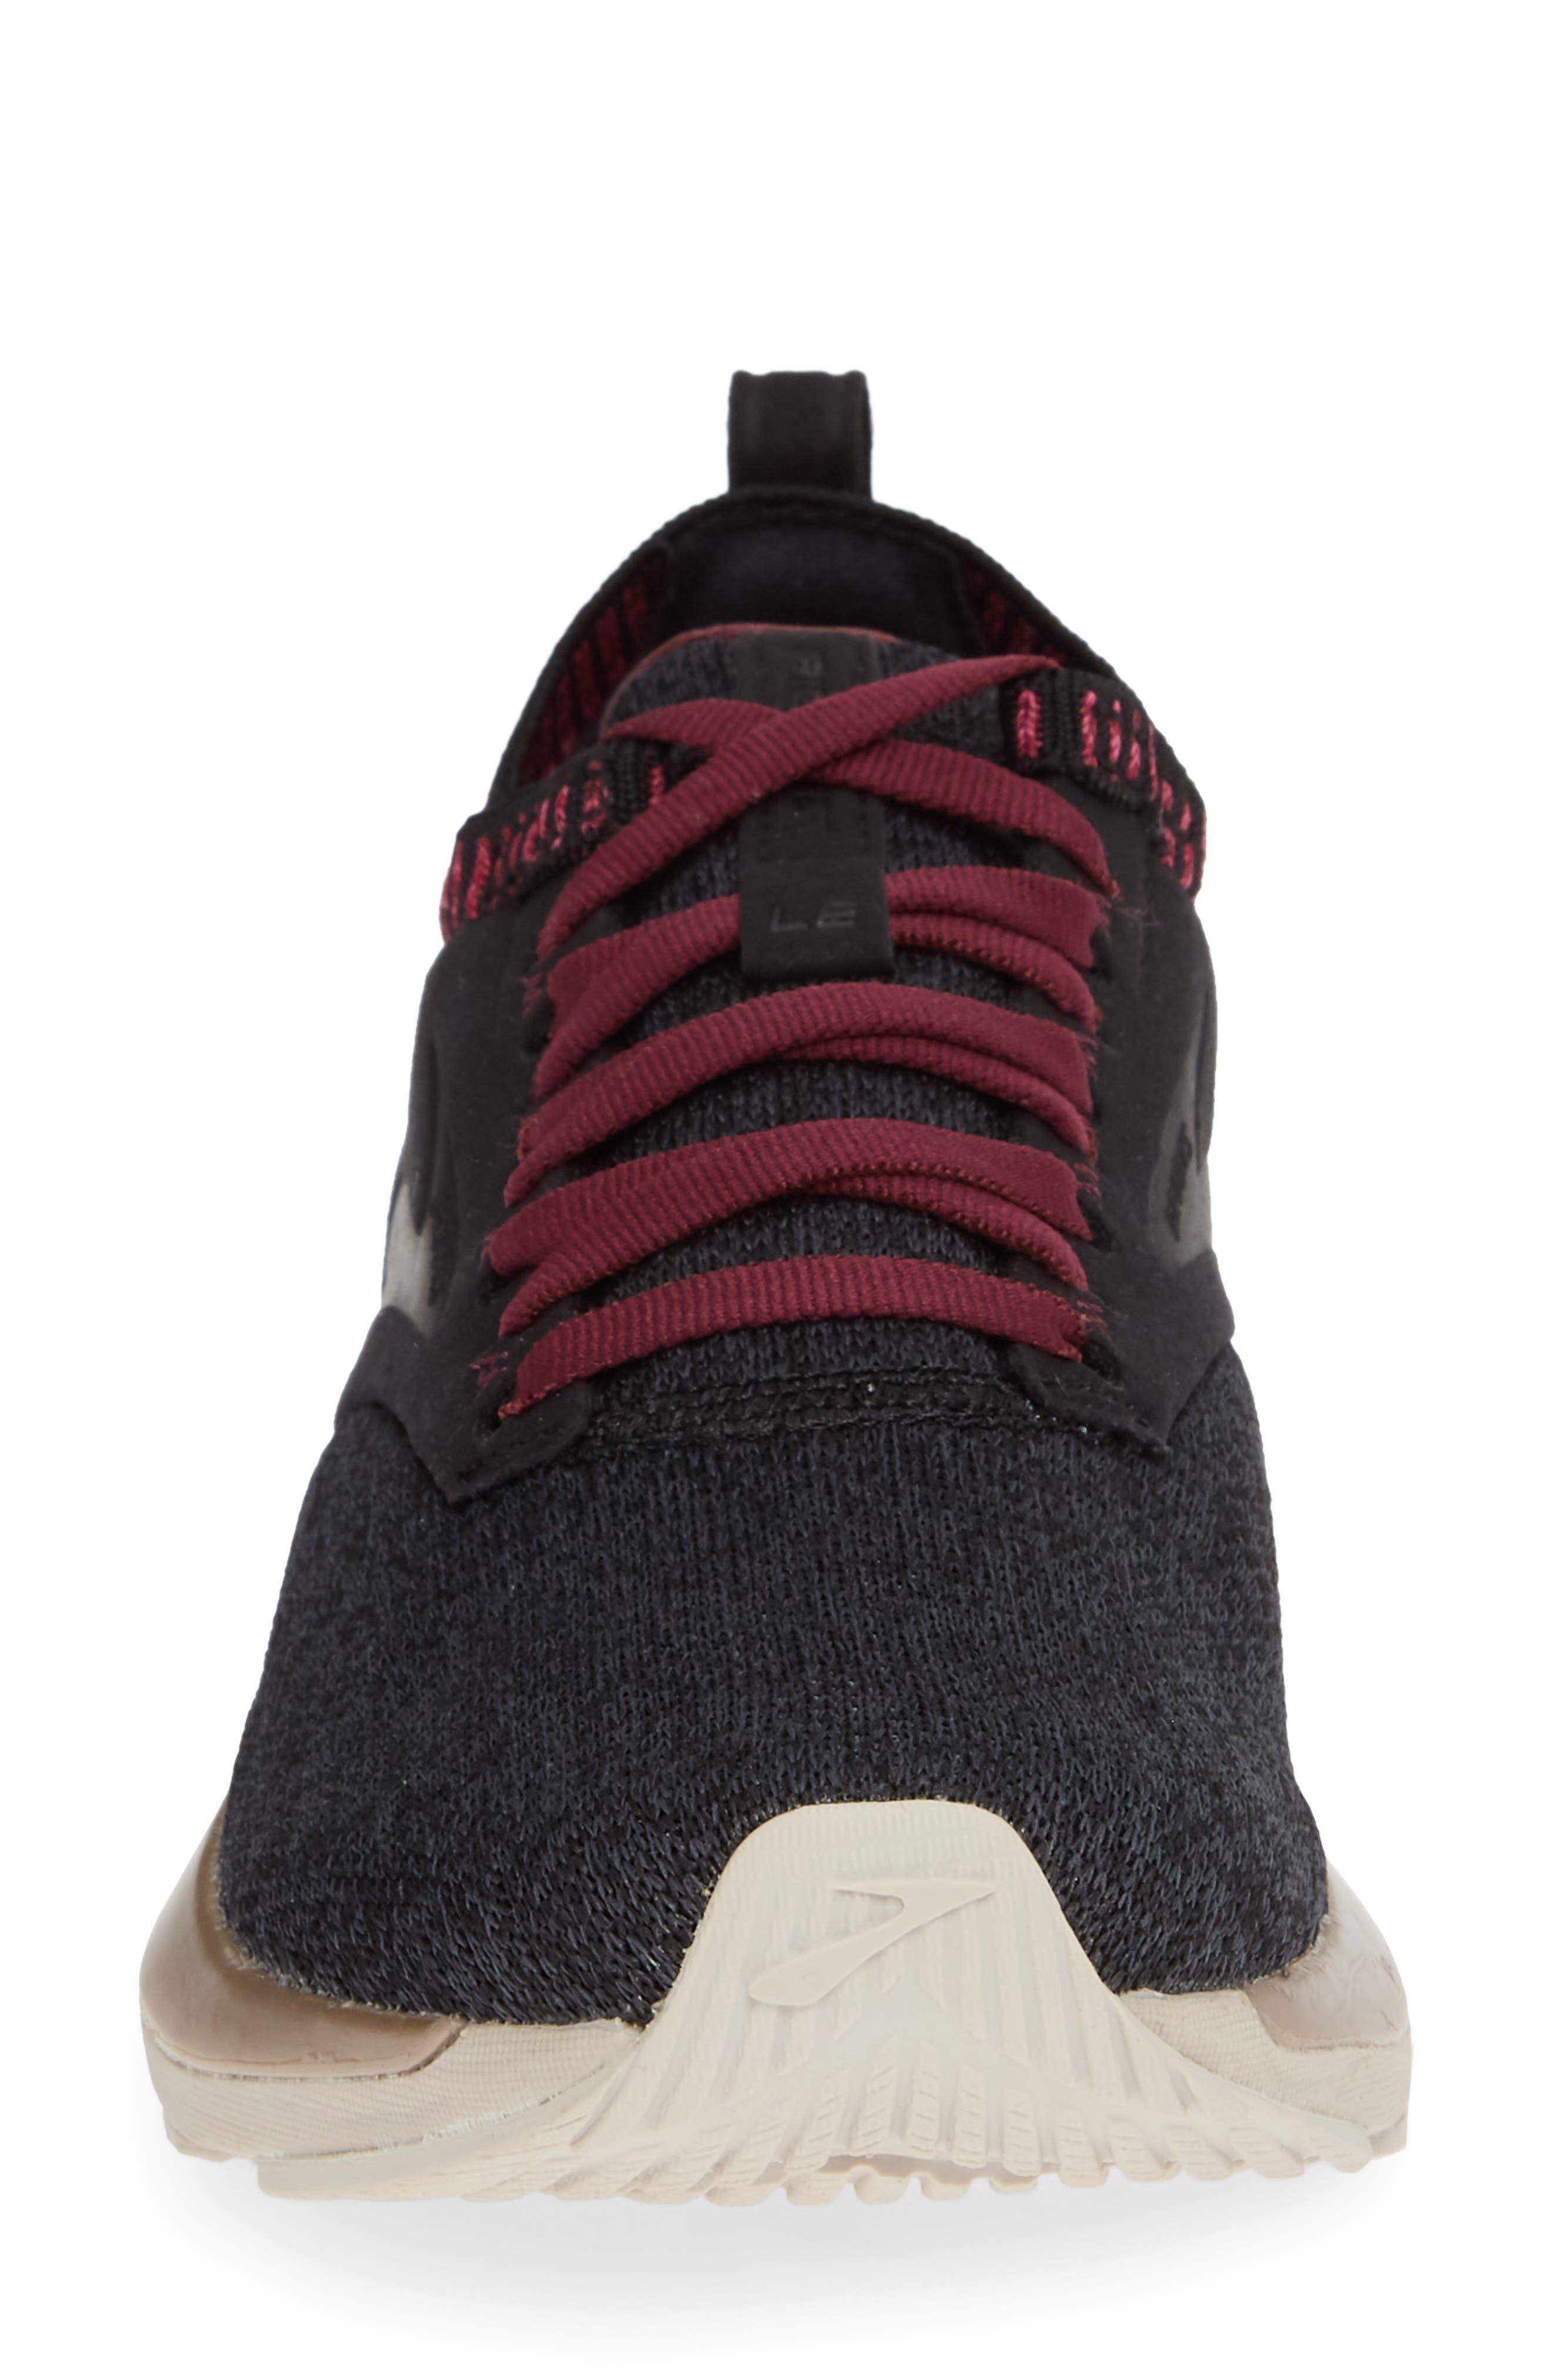 Ricochet LE Running Shoe,                             Alternate thumbnail 4, color,                             BLACK/ GREY/ PINK